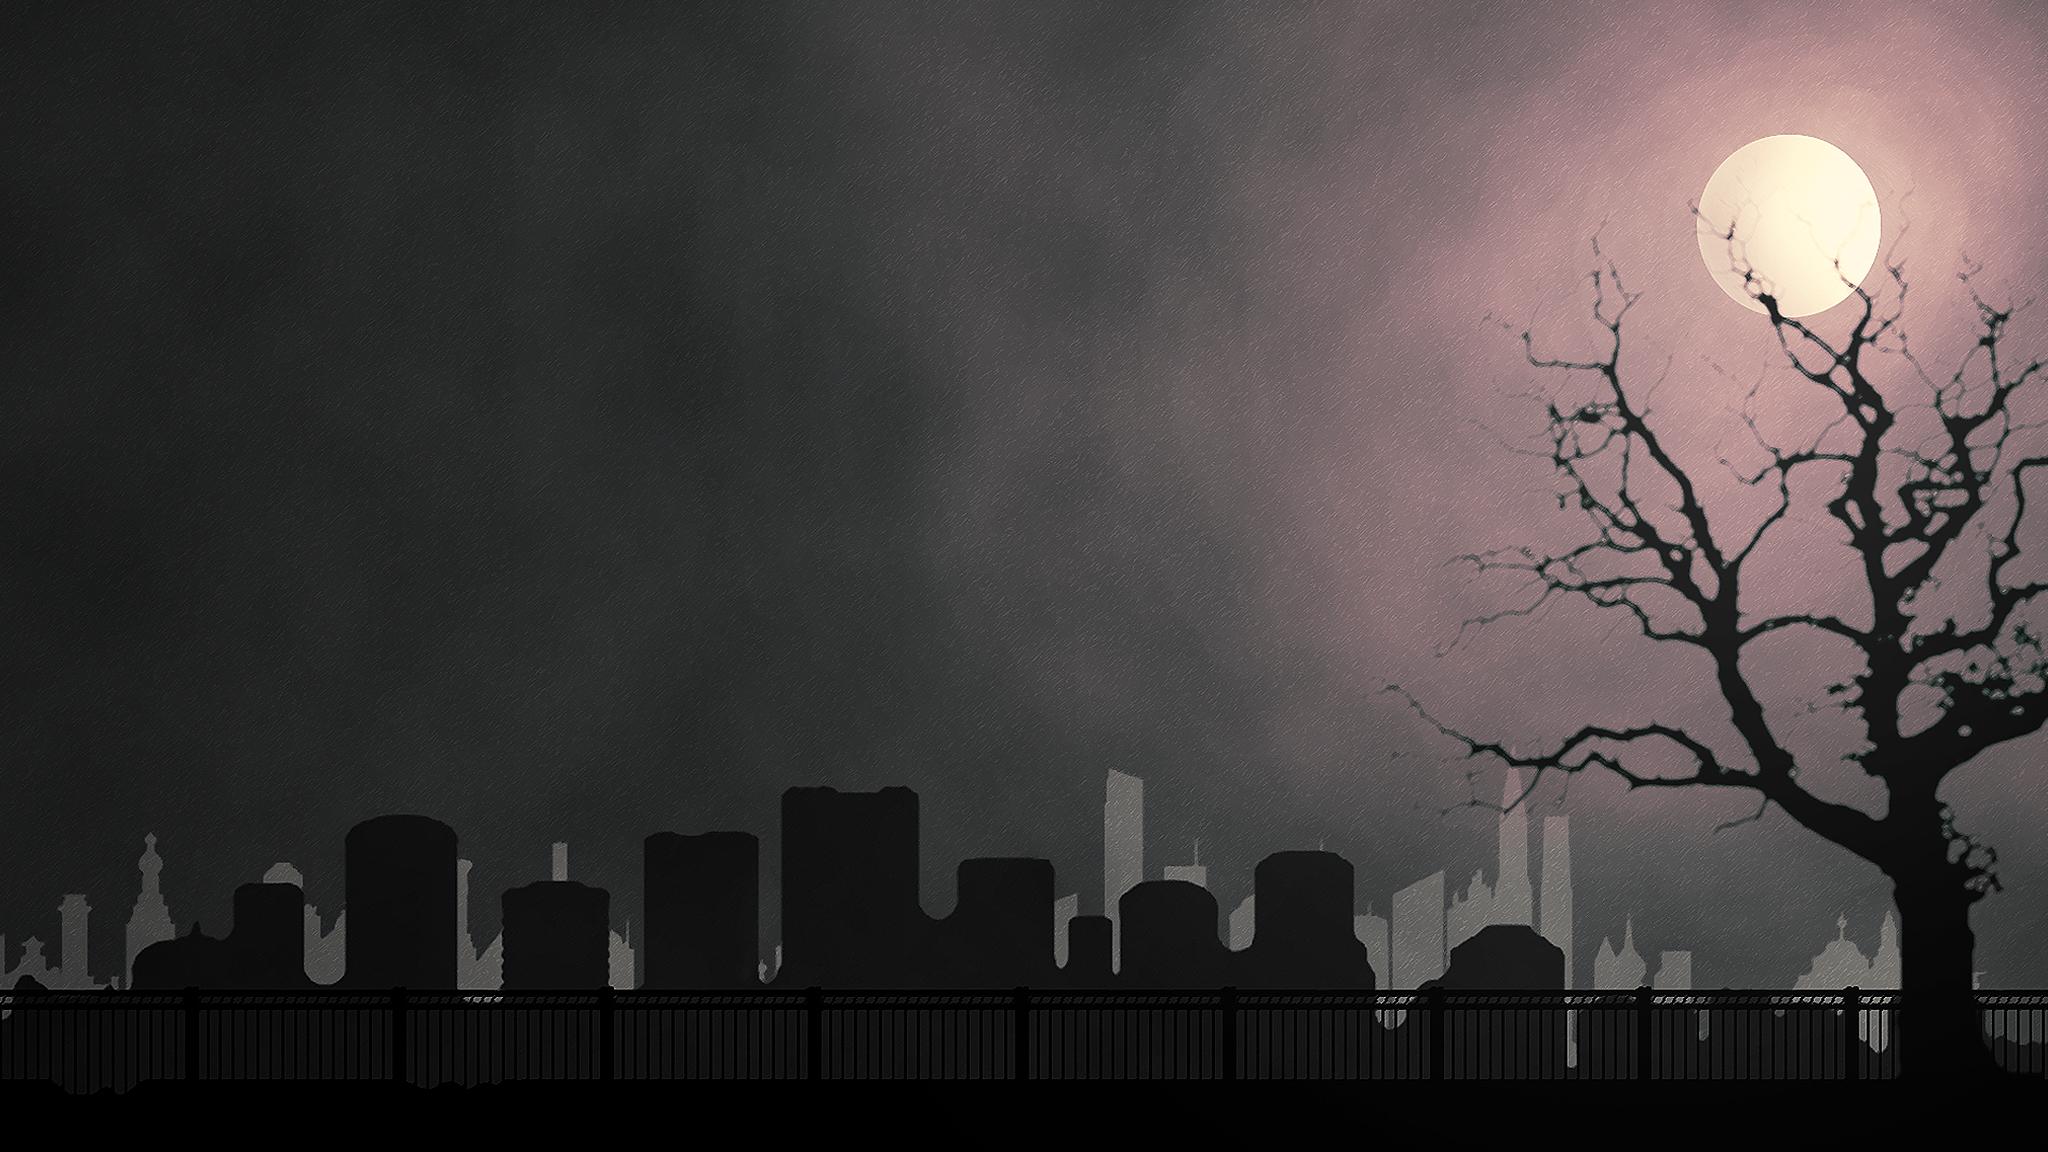 2d game background by dazgames on deviantart